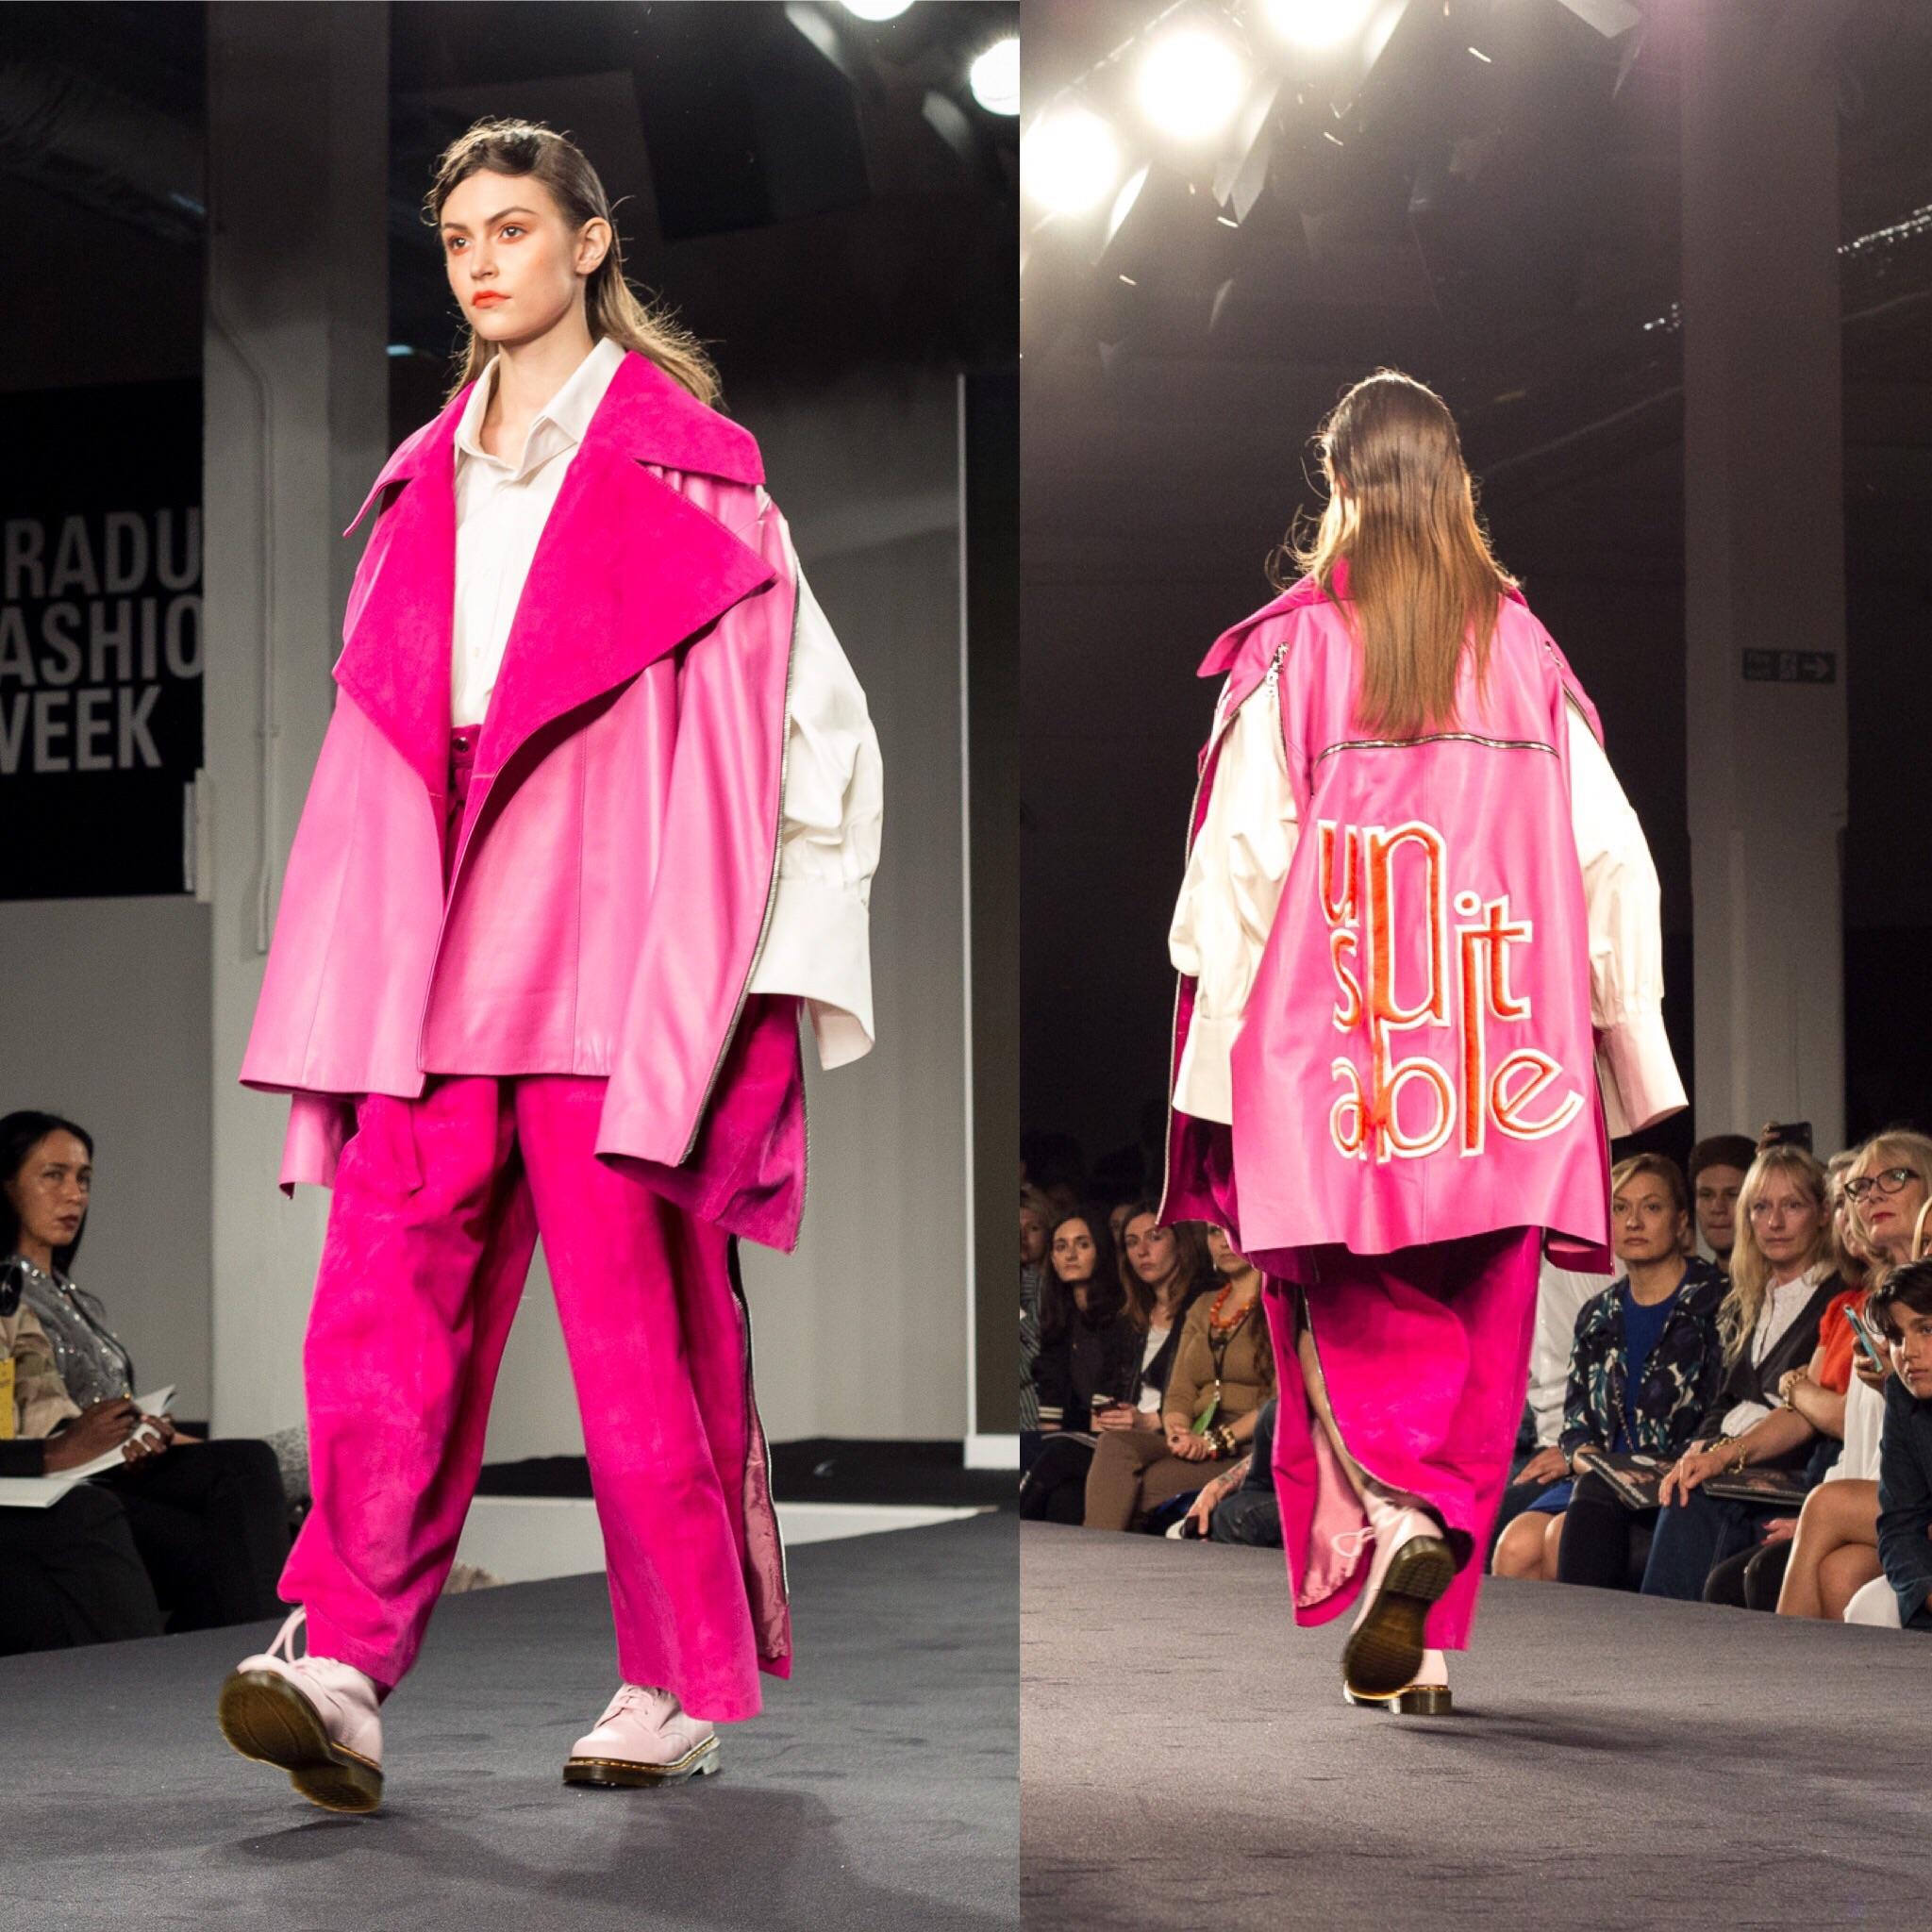 Ines Suelves Osorio - volume in pinks.